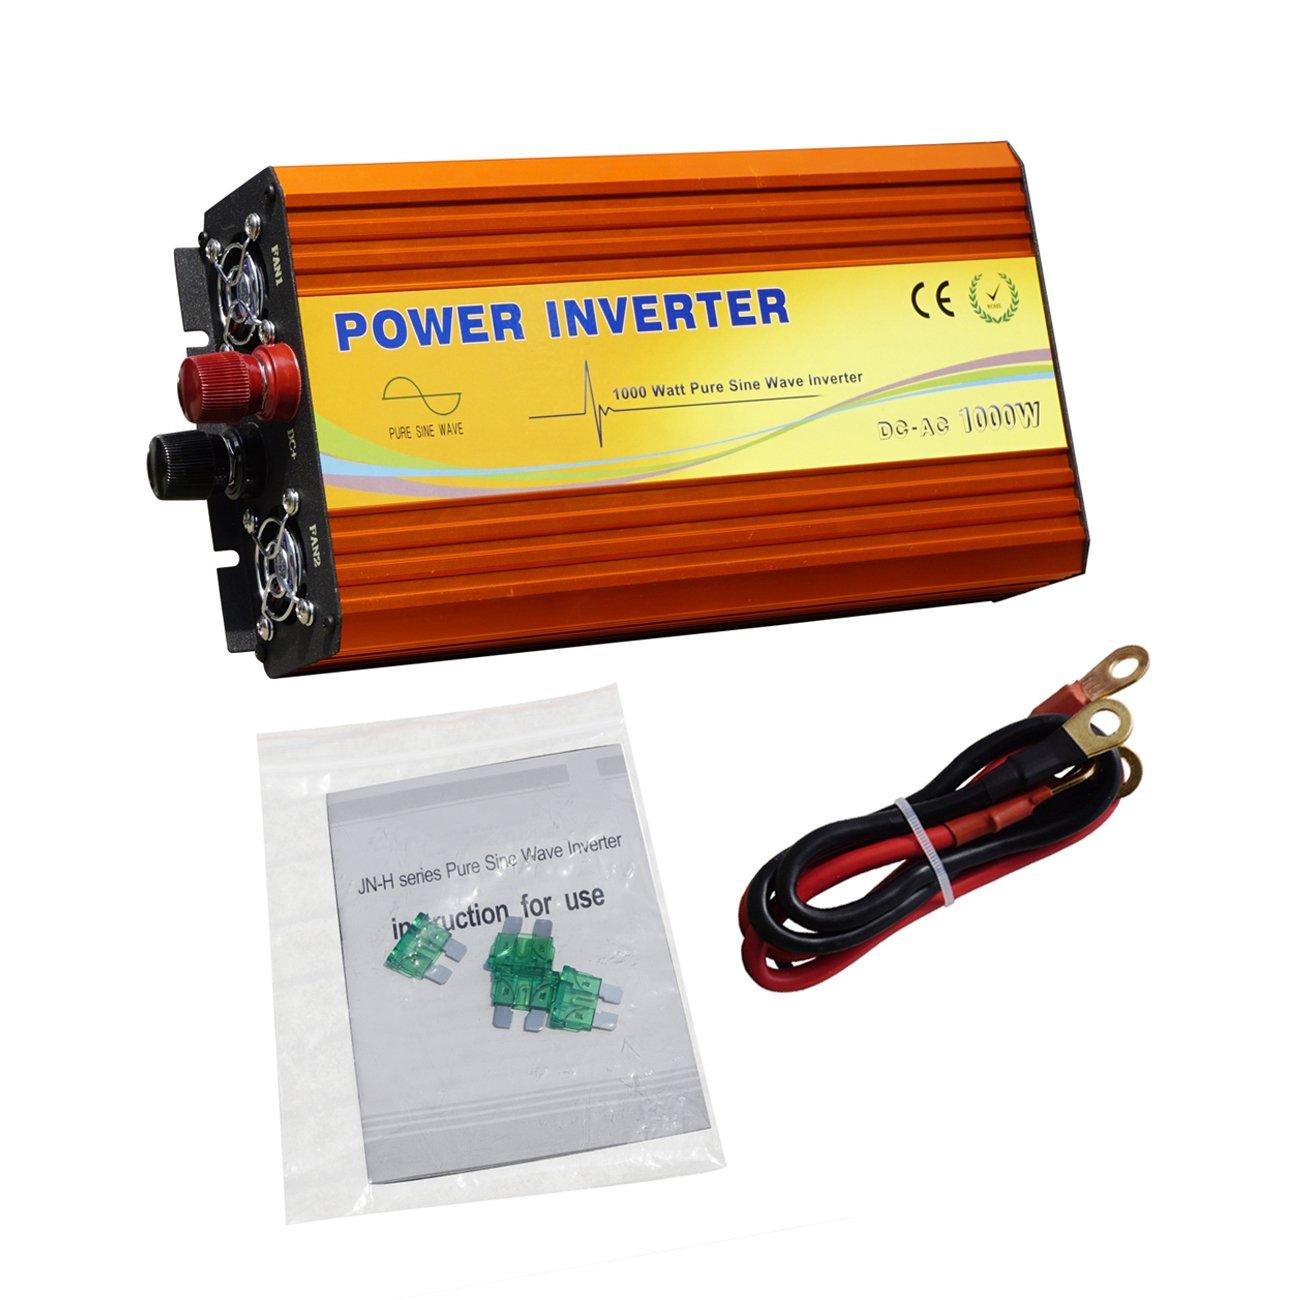 ECO-WORTHY 1000W 24V Pure Sine Inverter 110V DC Off Grid Inverter W/MPPT Function (1000W 24V Input)